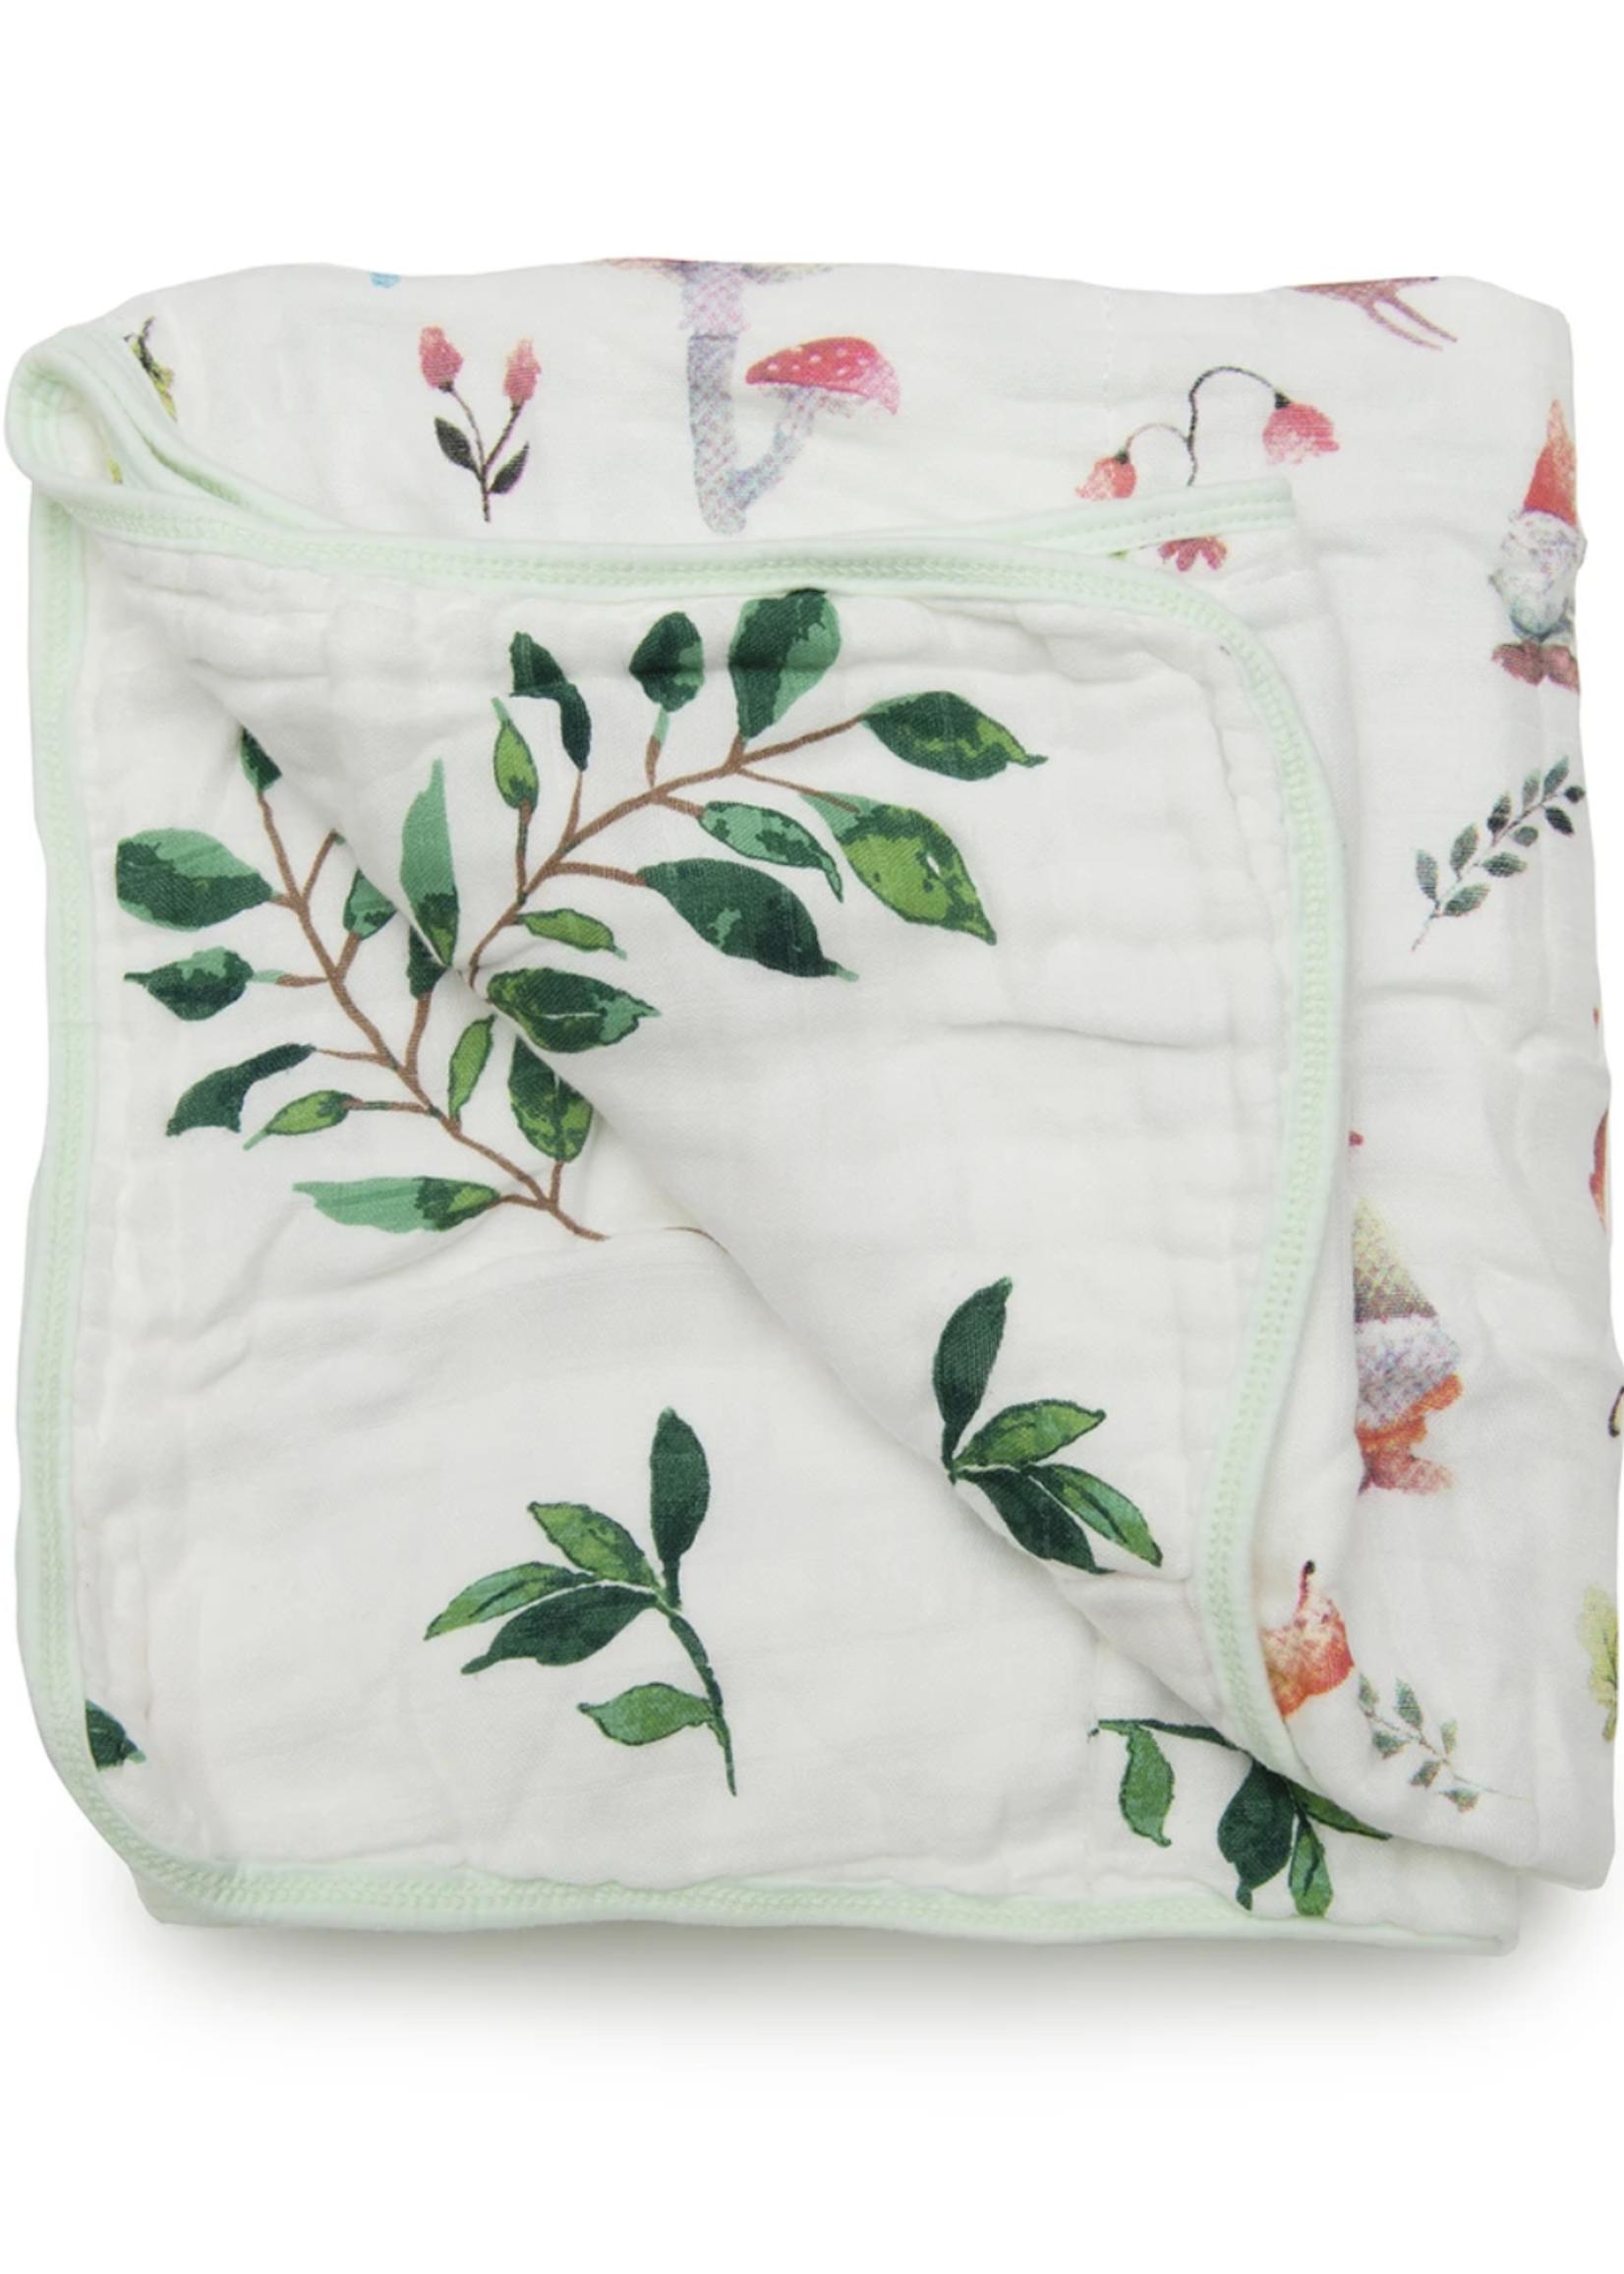 Elitaire Petite Muslin Quilt Blanket - Woodland Gnome